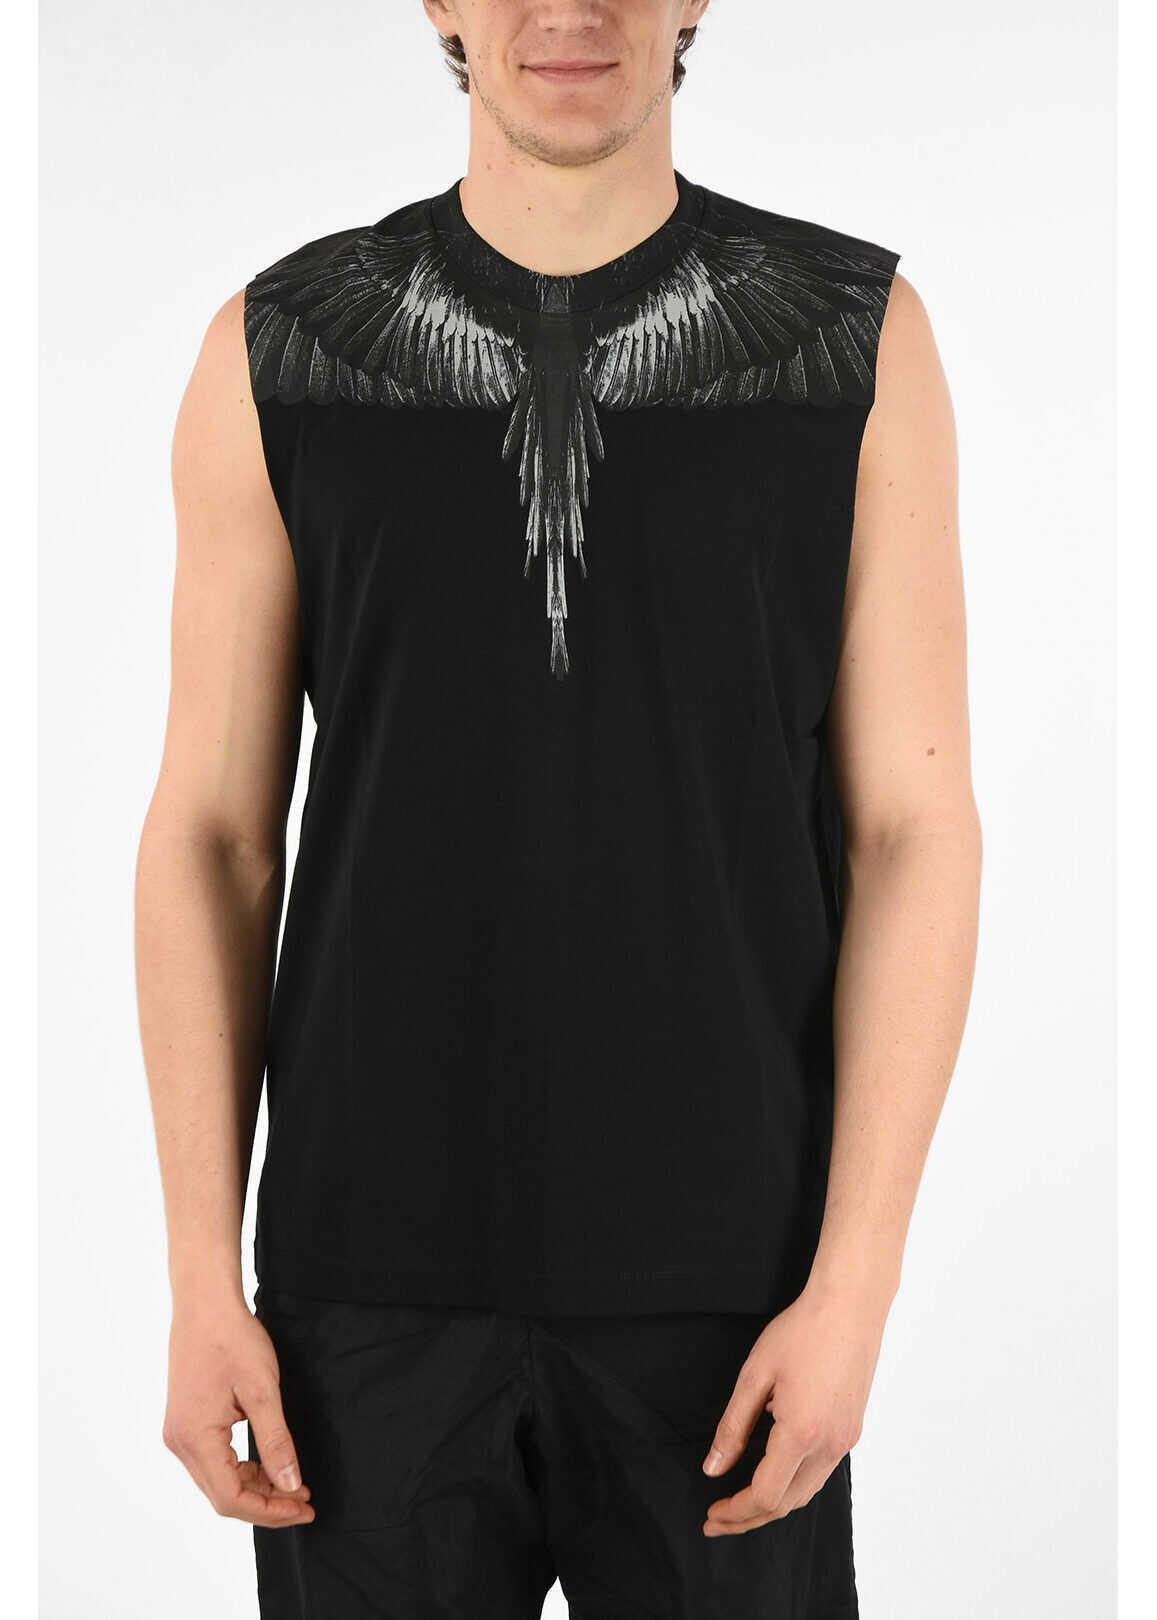 Marcelo Burlon Cotton Sleeveless BLACK WINGS T-Shirt with Print BLACK imagine